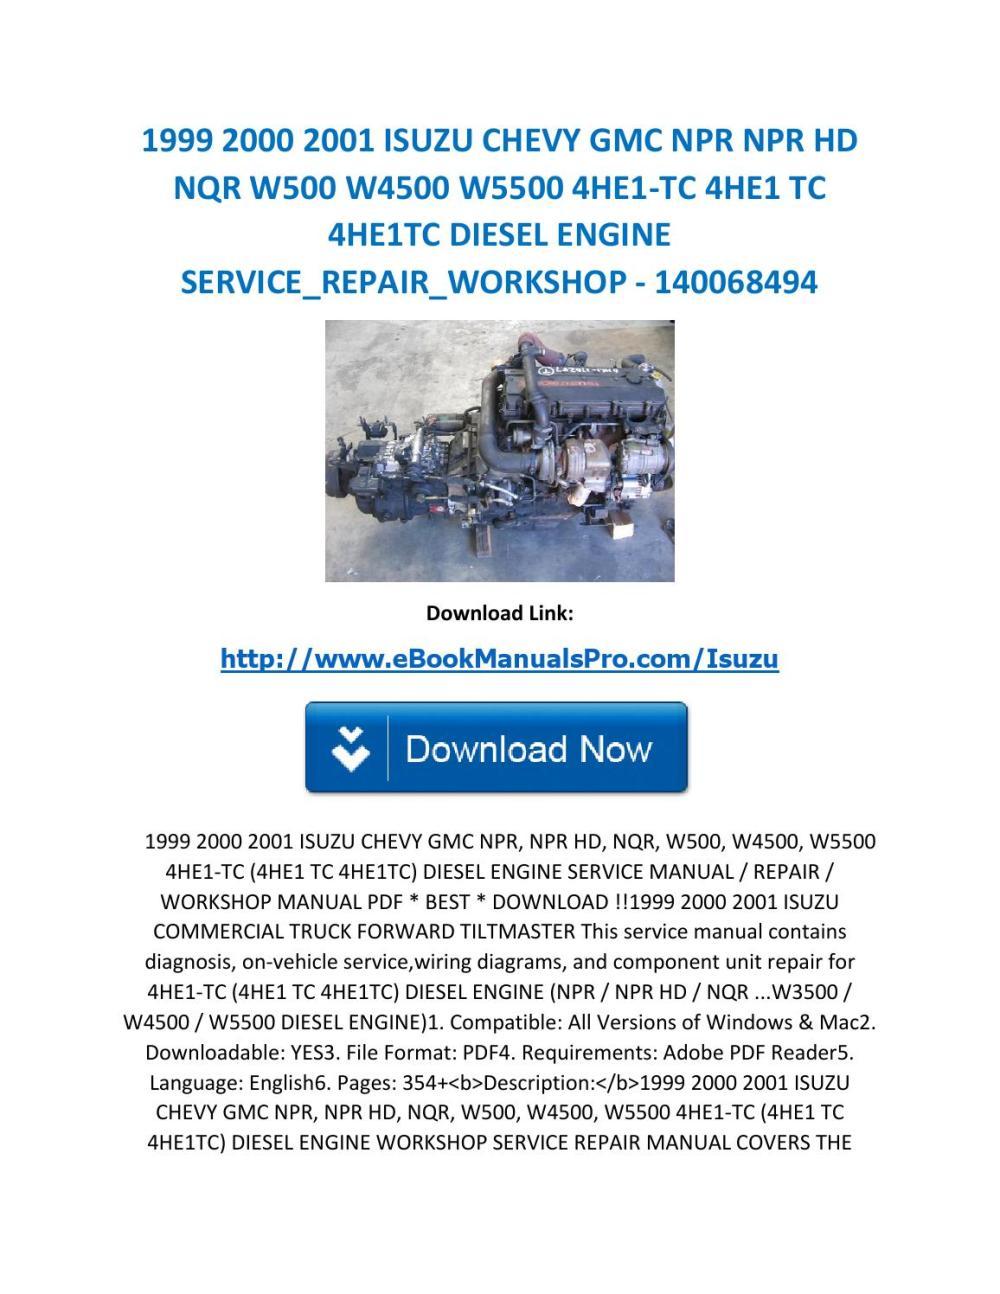 medium resolution of 2001 isuzu npr manual isuzu service manual 2001 isuzu npr manual pdf wiring diagrams with a 0 2007 isuzu npr service manual pdf isuzu npr service manual